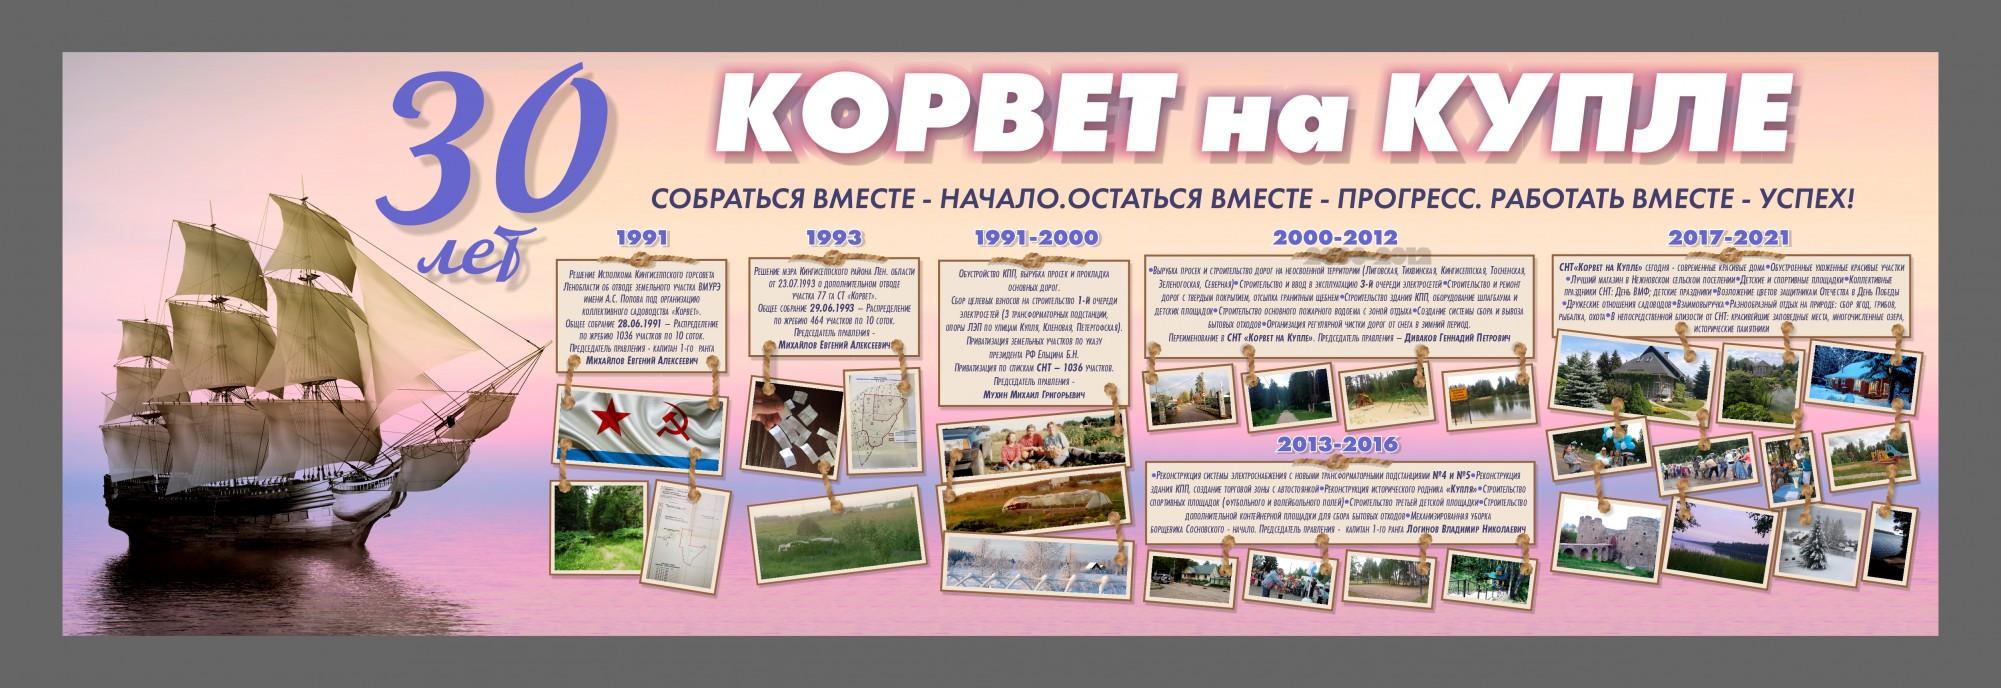 korvet_banner30years_4500x1400mm_prw6-1